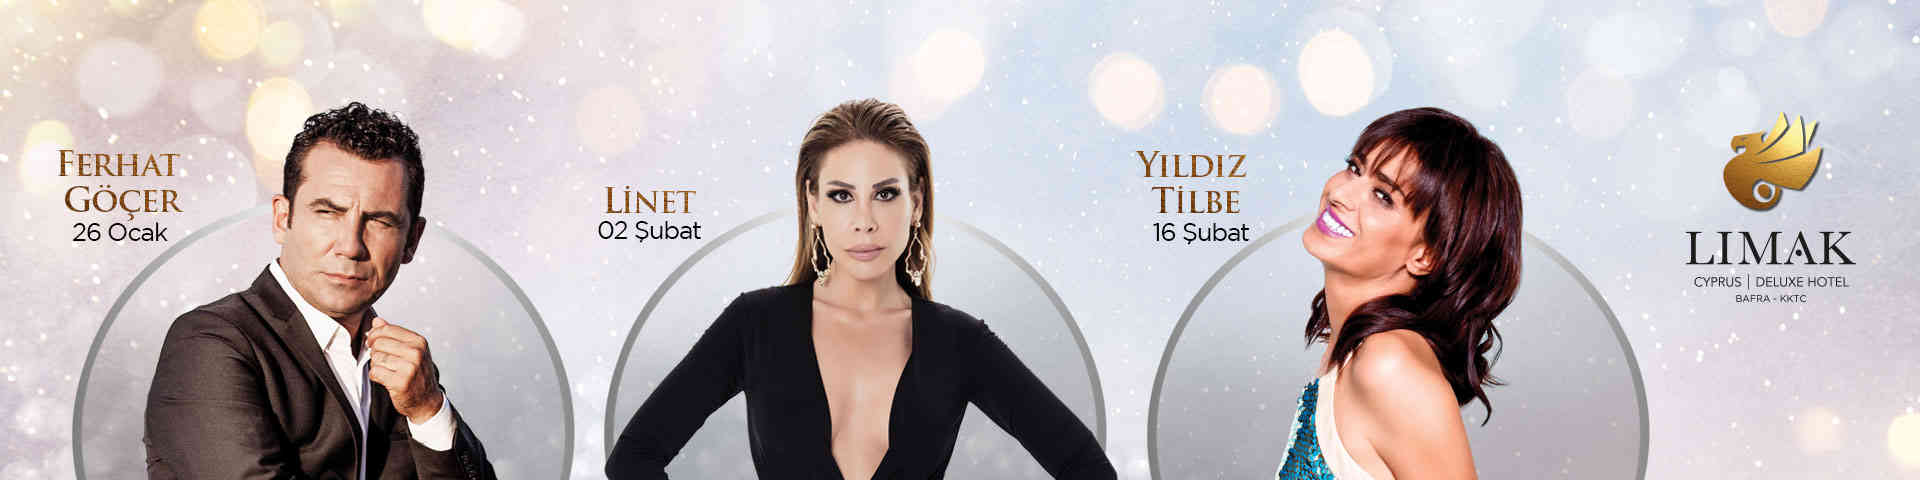 Limak Cyprus Konserleri